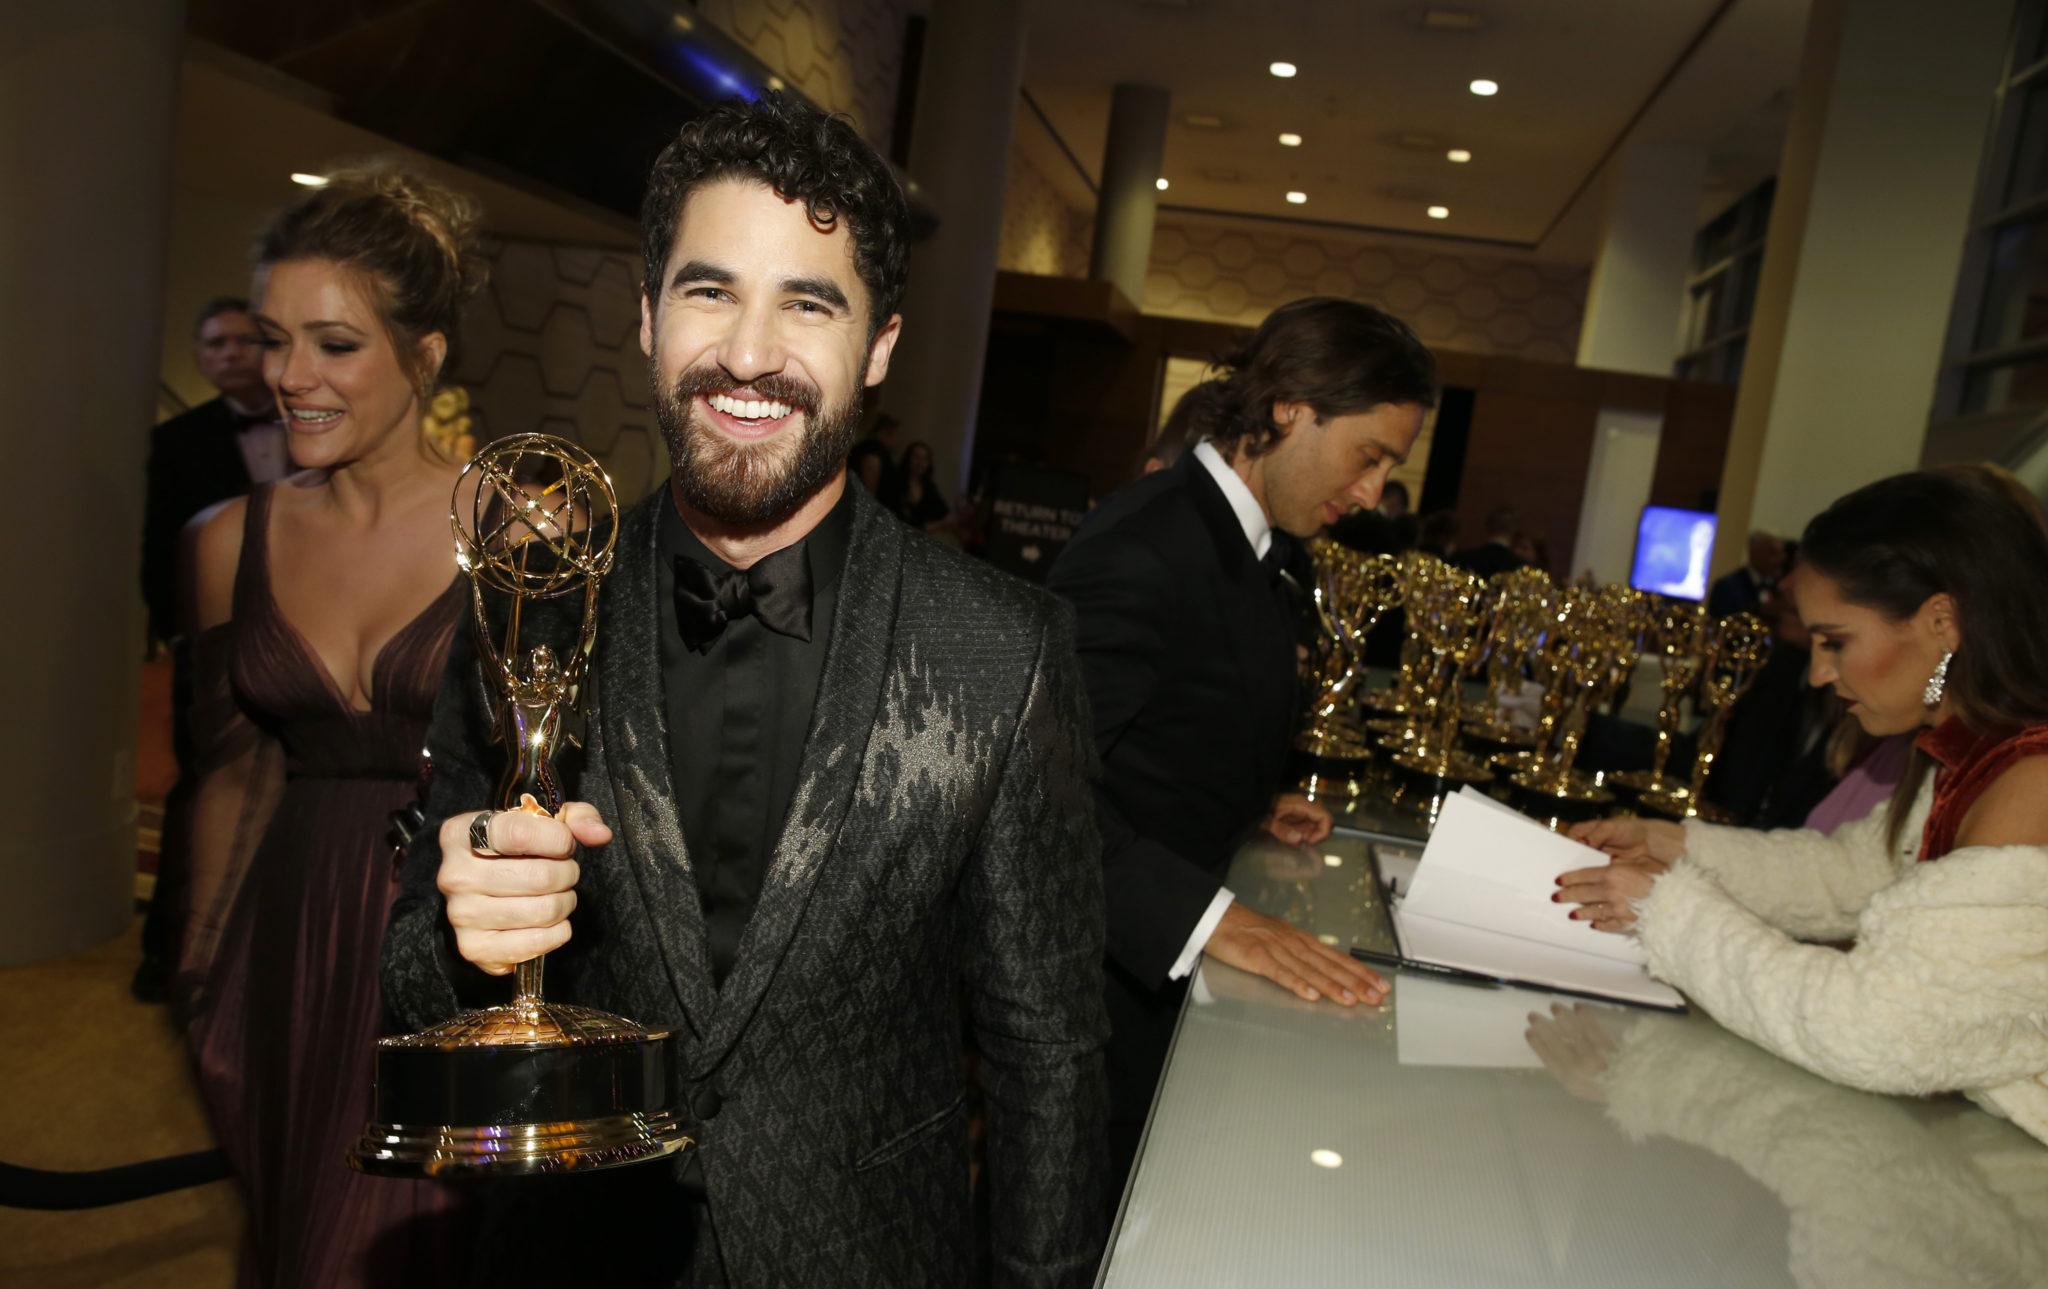 Darren Criss Emmy Awards 4chion Lifestyle